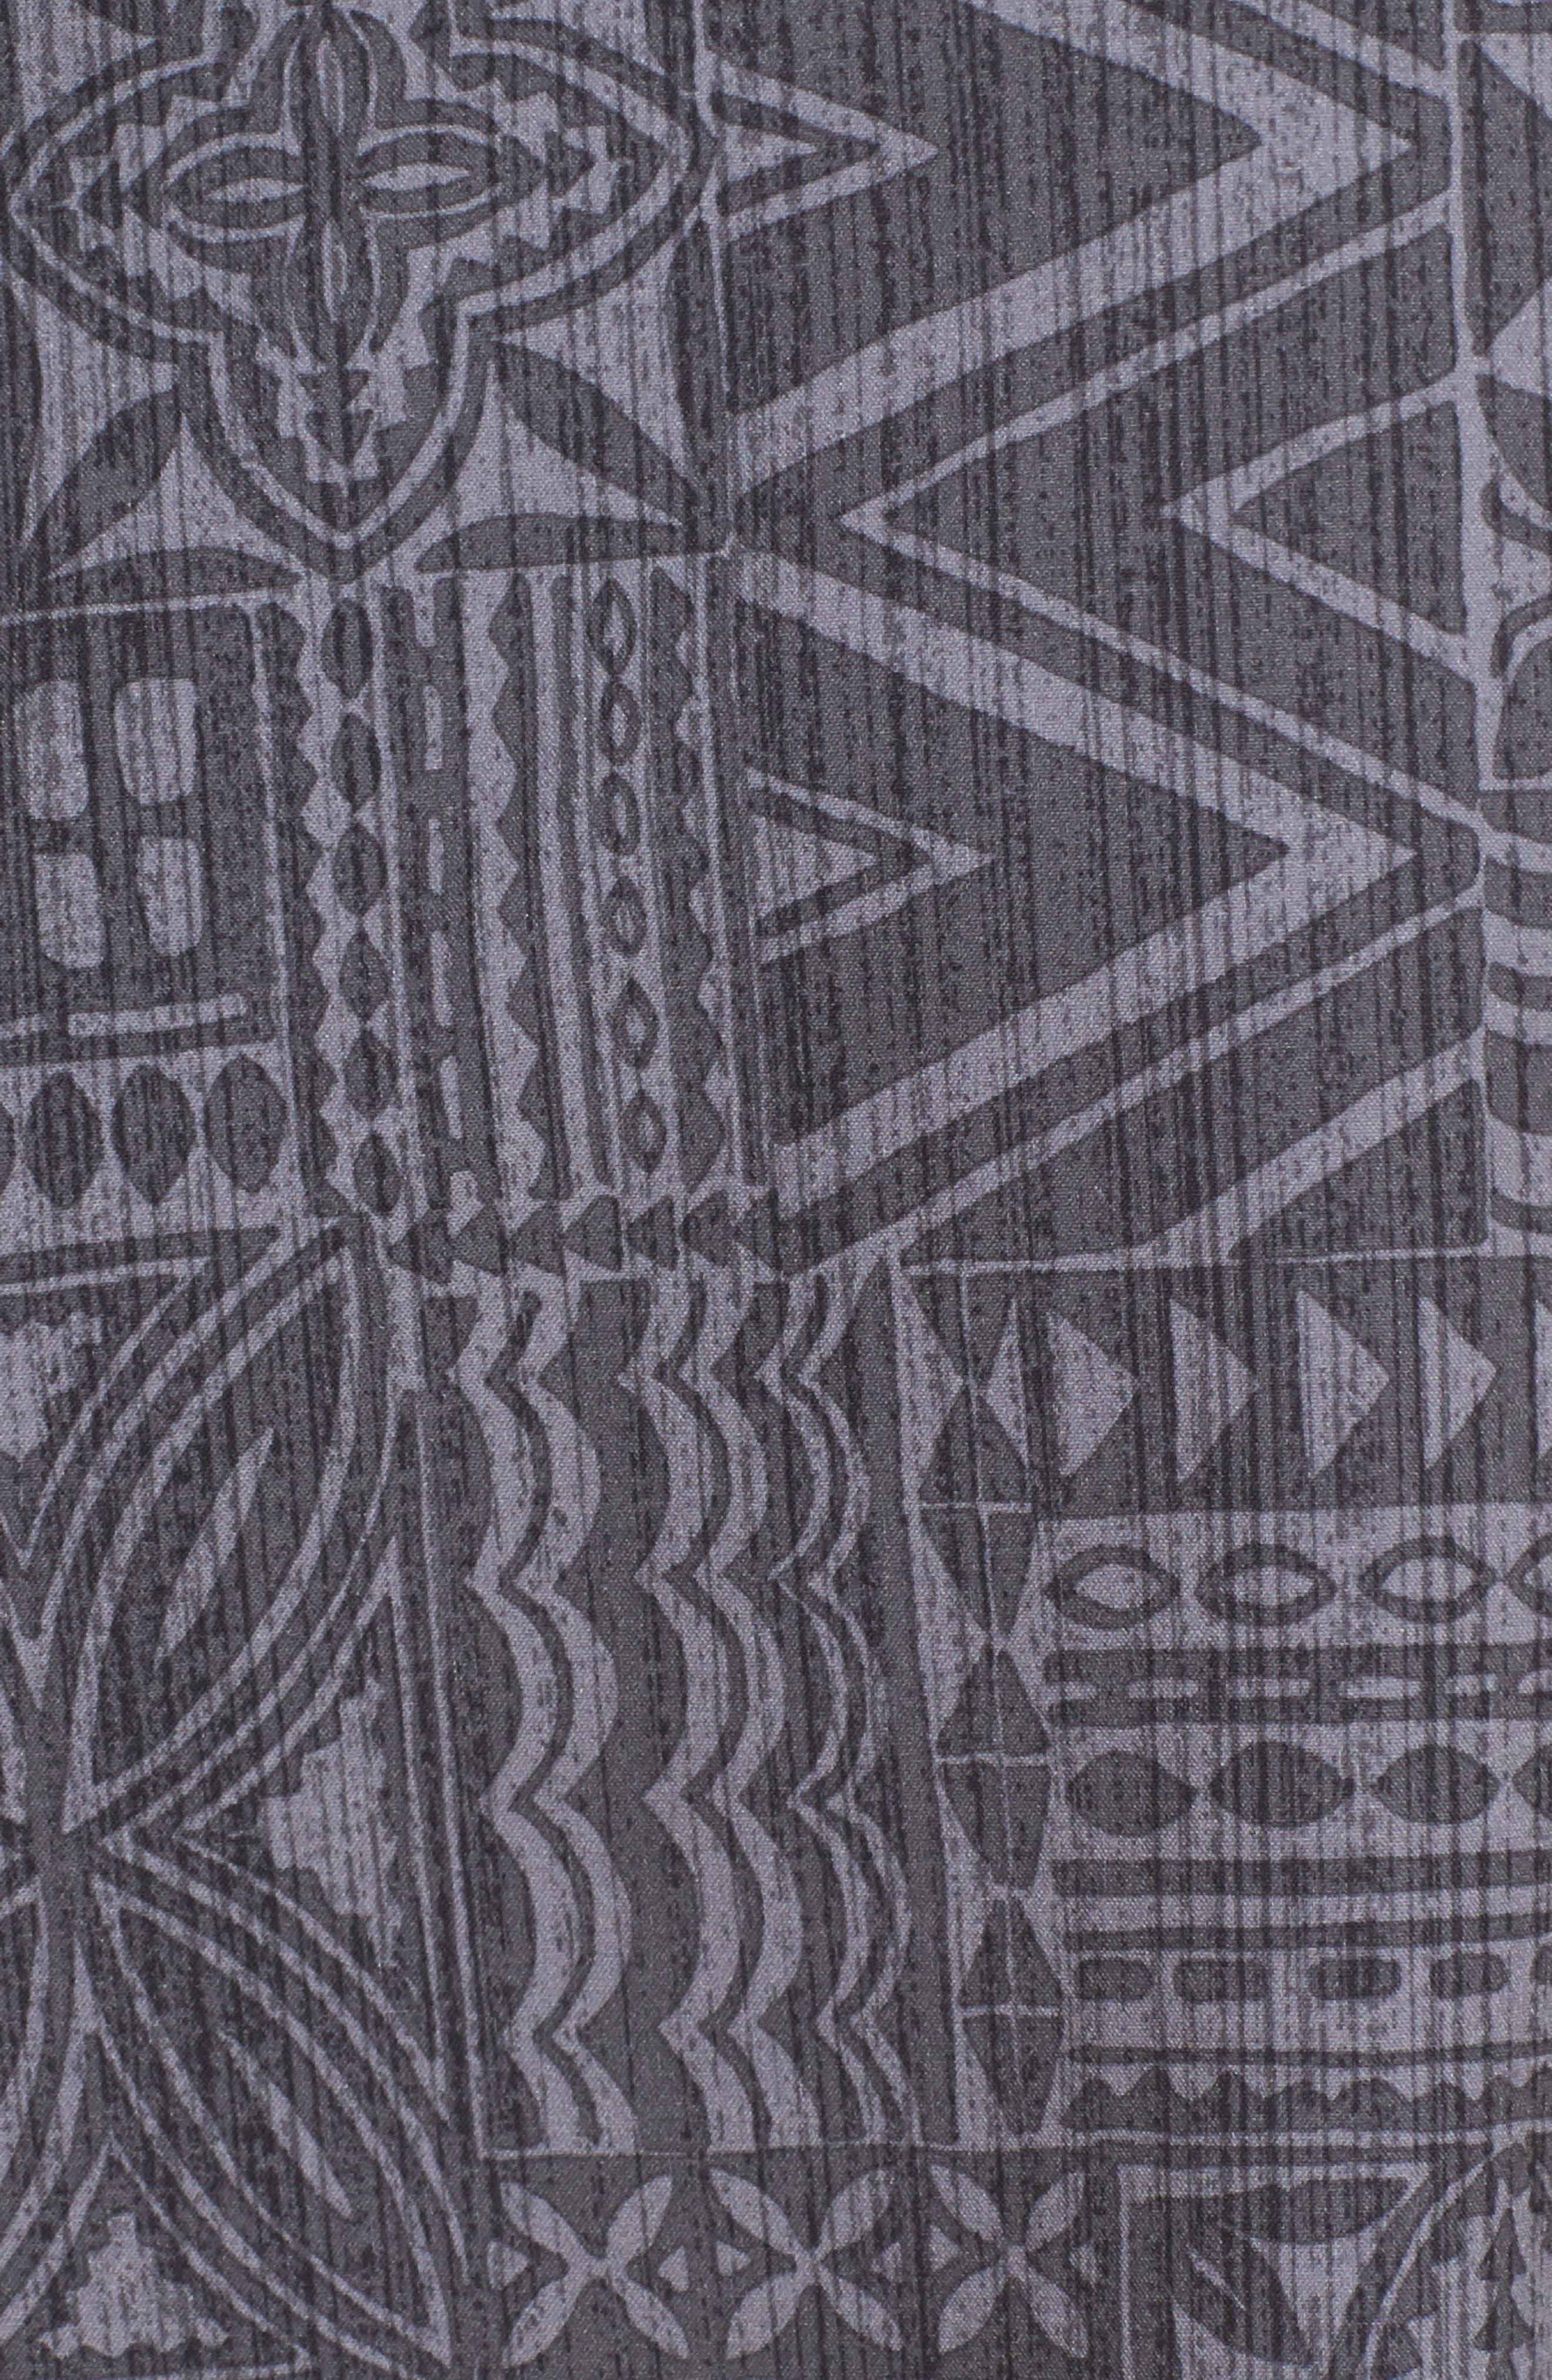 Diamond Head Board Shorts,                             Alternate thumbnail 5, color,                             Charcoal